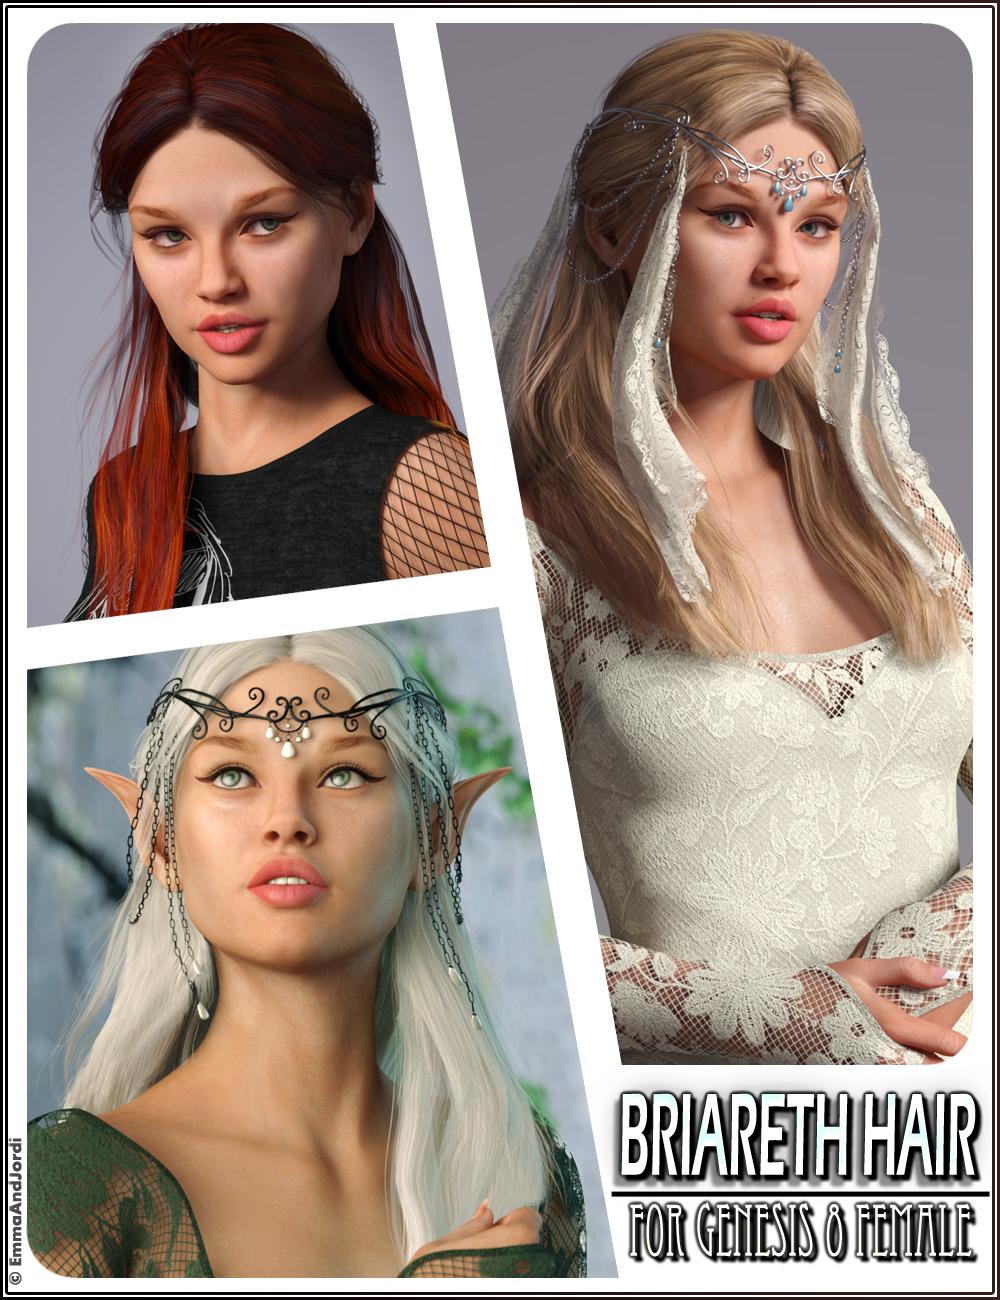 Briareth Hair for Genesis 8 Female(s) by: EmmaAndJordi, 3D Models by Daz 3D